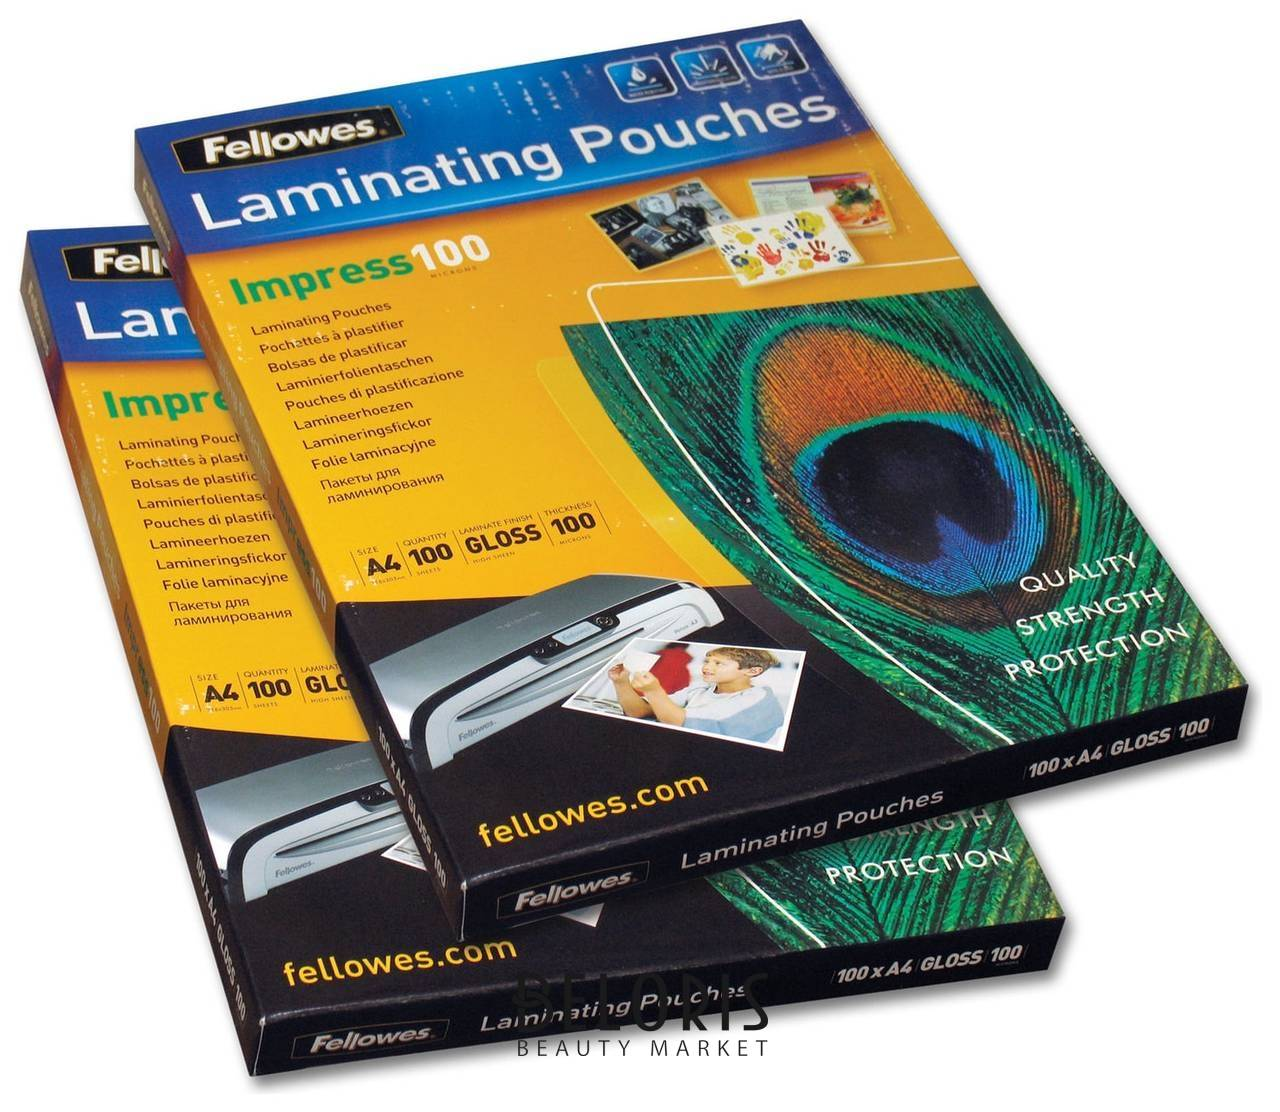 Пленки-заготовки для ламинирования, А4, комплект 100 шт., 100 мкм, FELLOWES  Fellowes